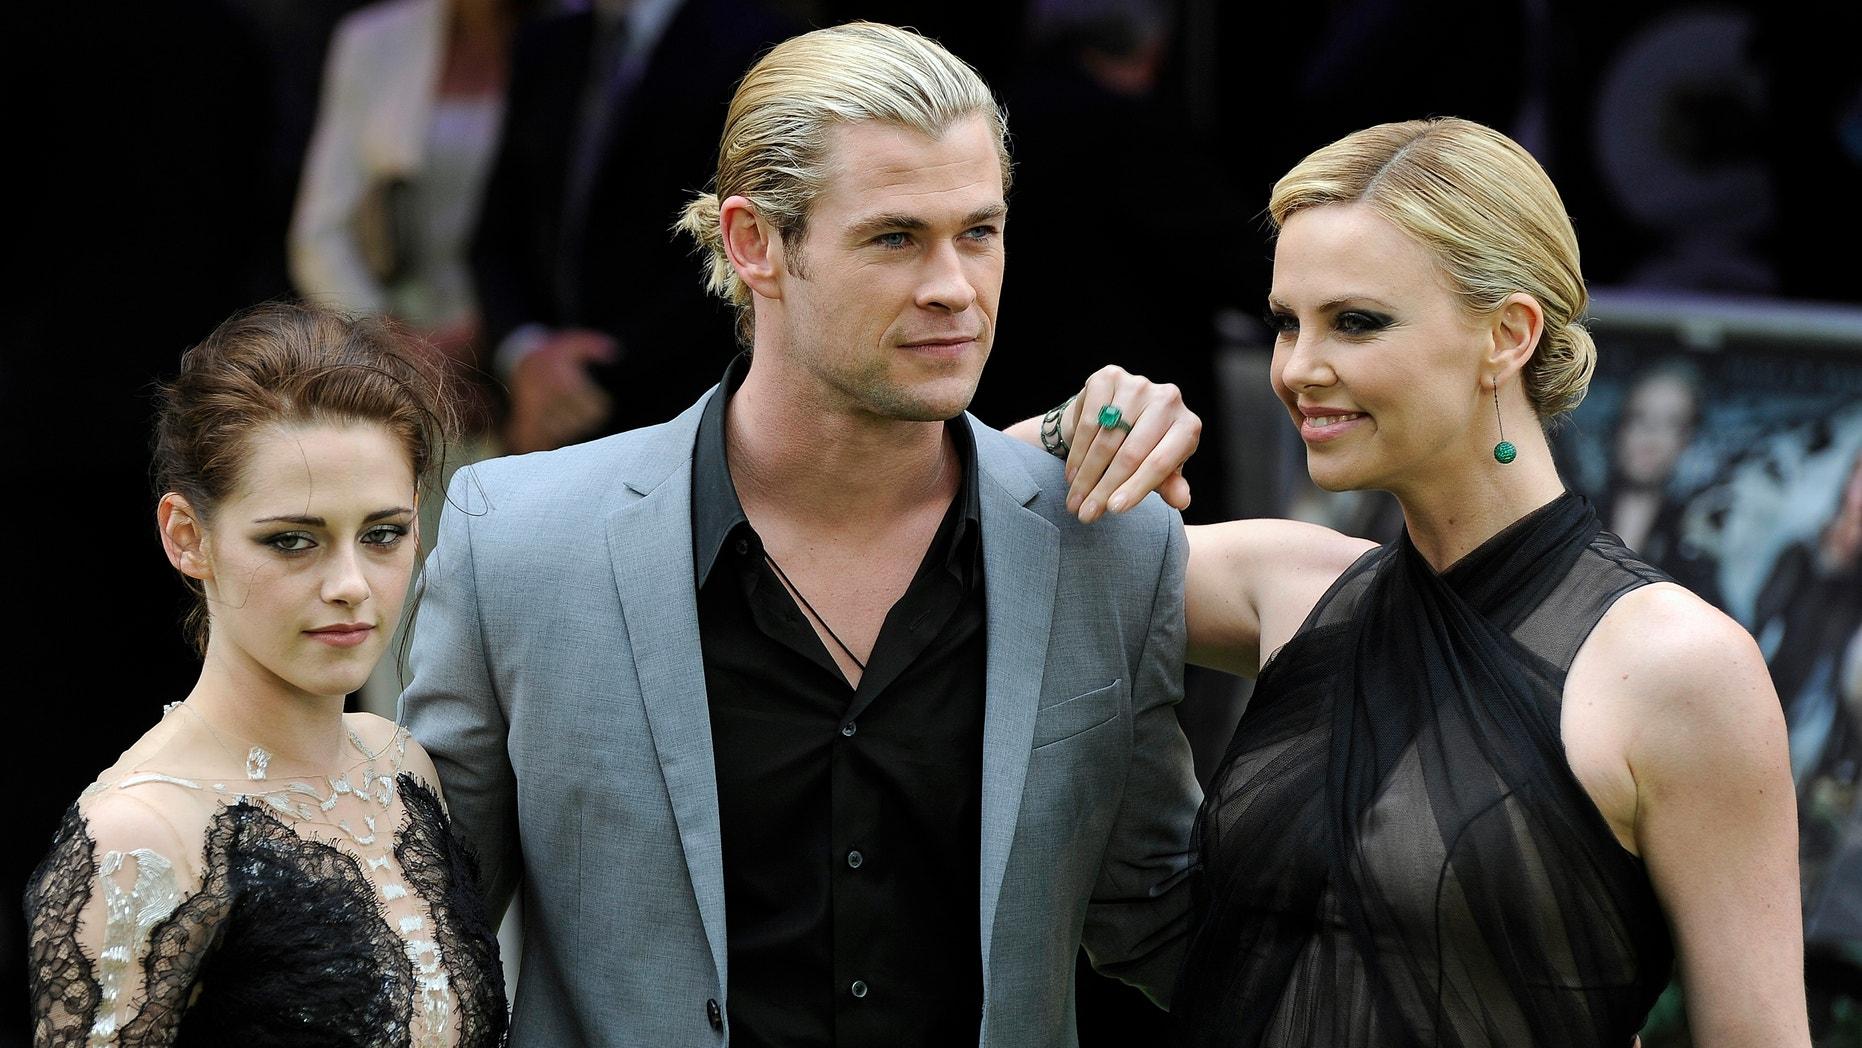 'Snow White and the Huntsman' stars Kristen Stewart, Chris Hemsworth and Charlize Theron.